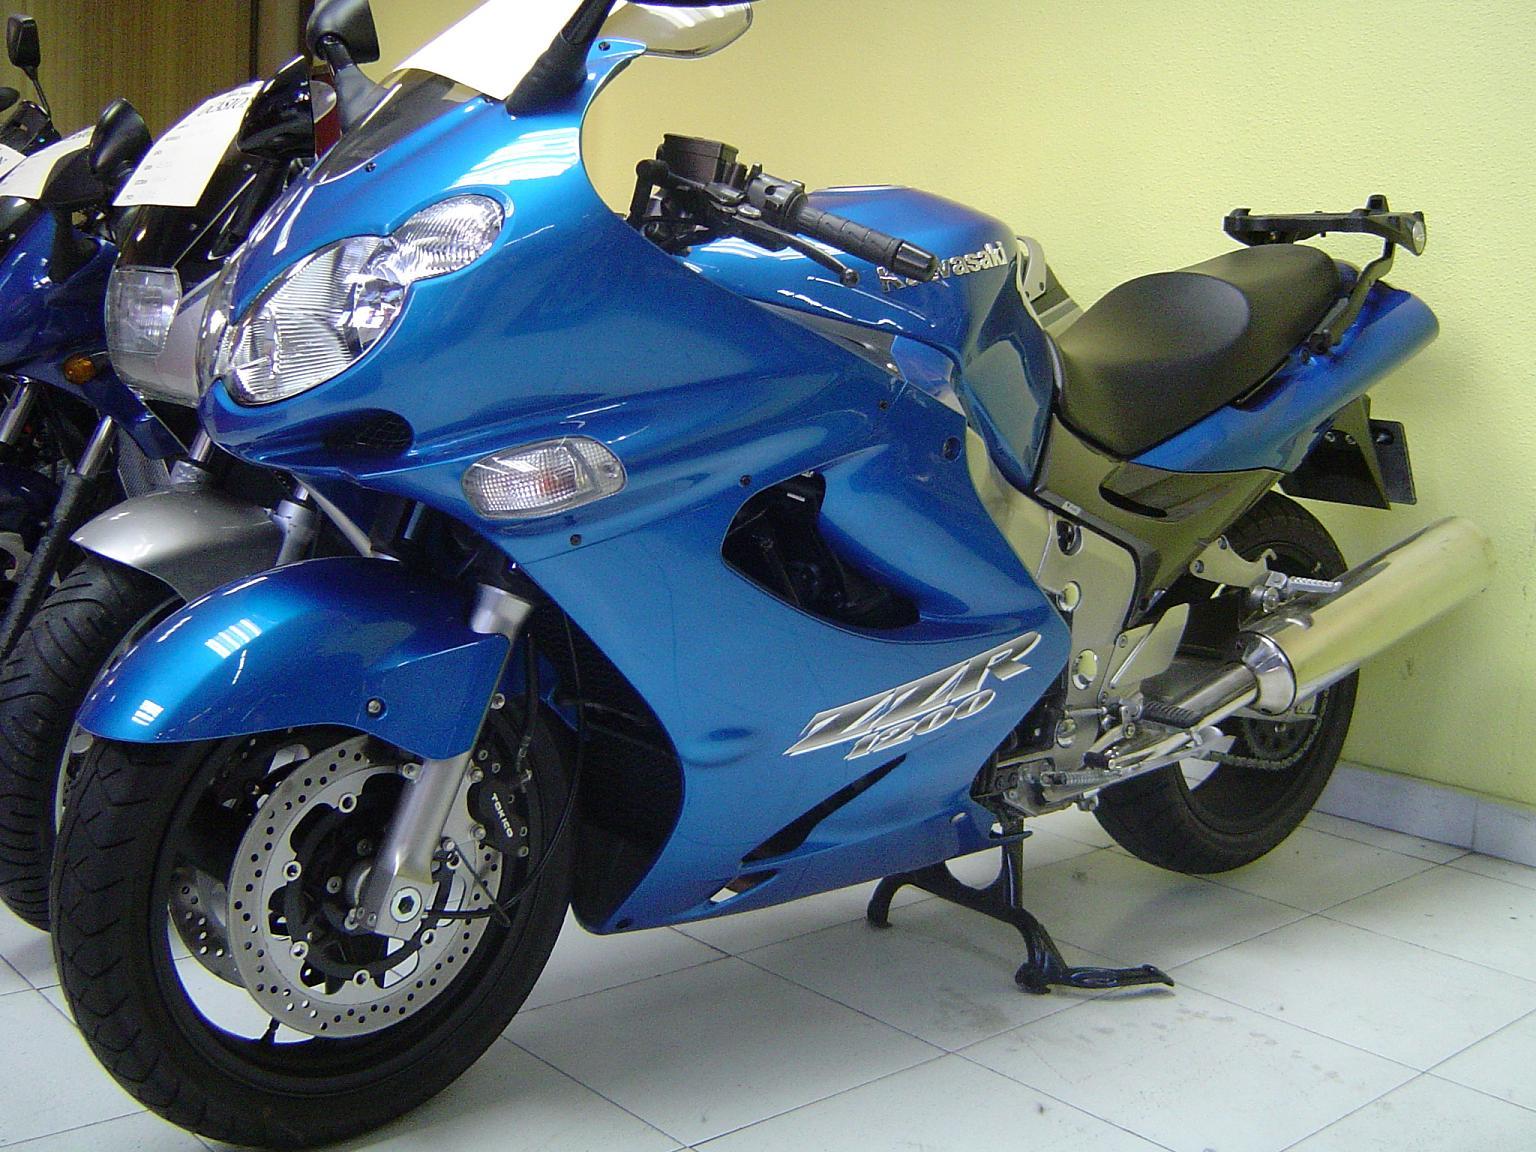 Kawasaki ZZR1200 photos - PhotoGallery with 4 pics ...